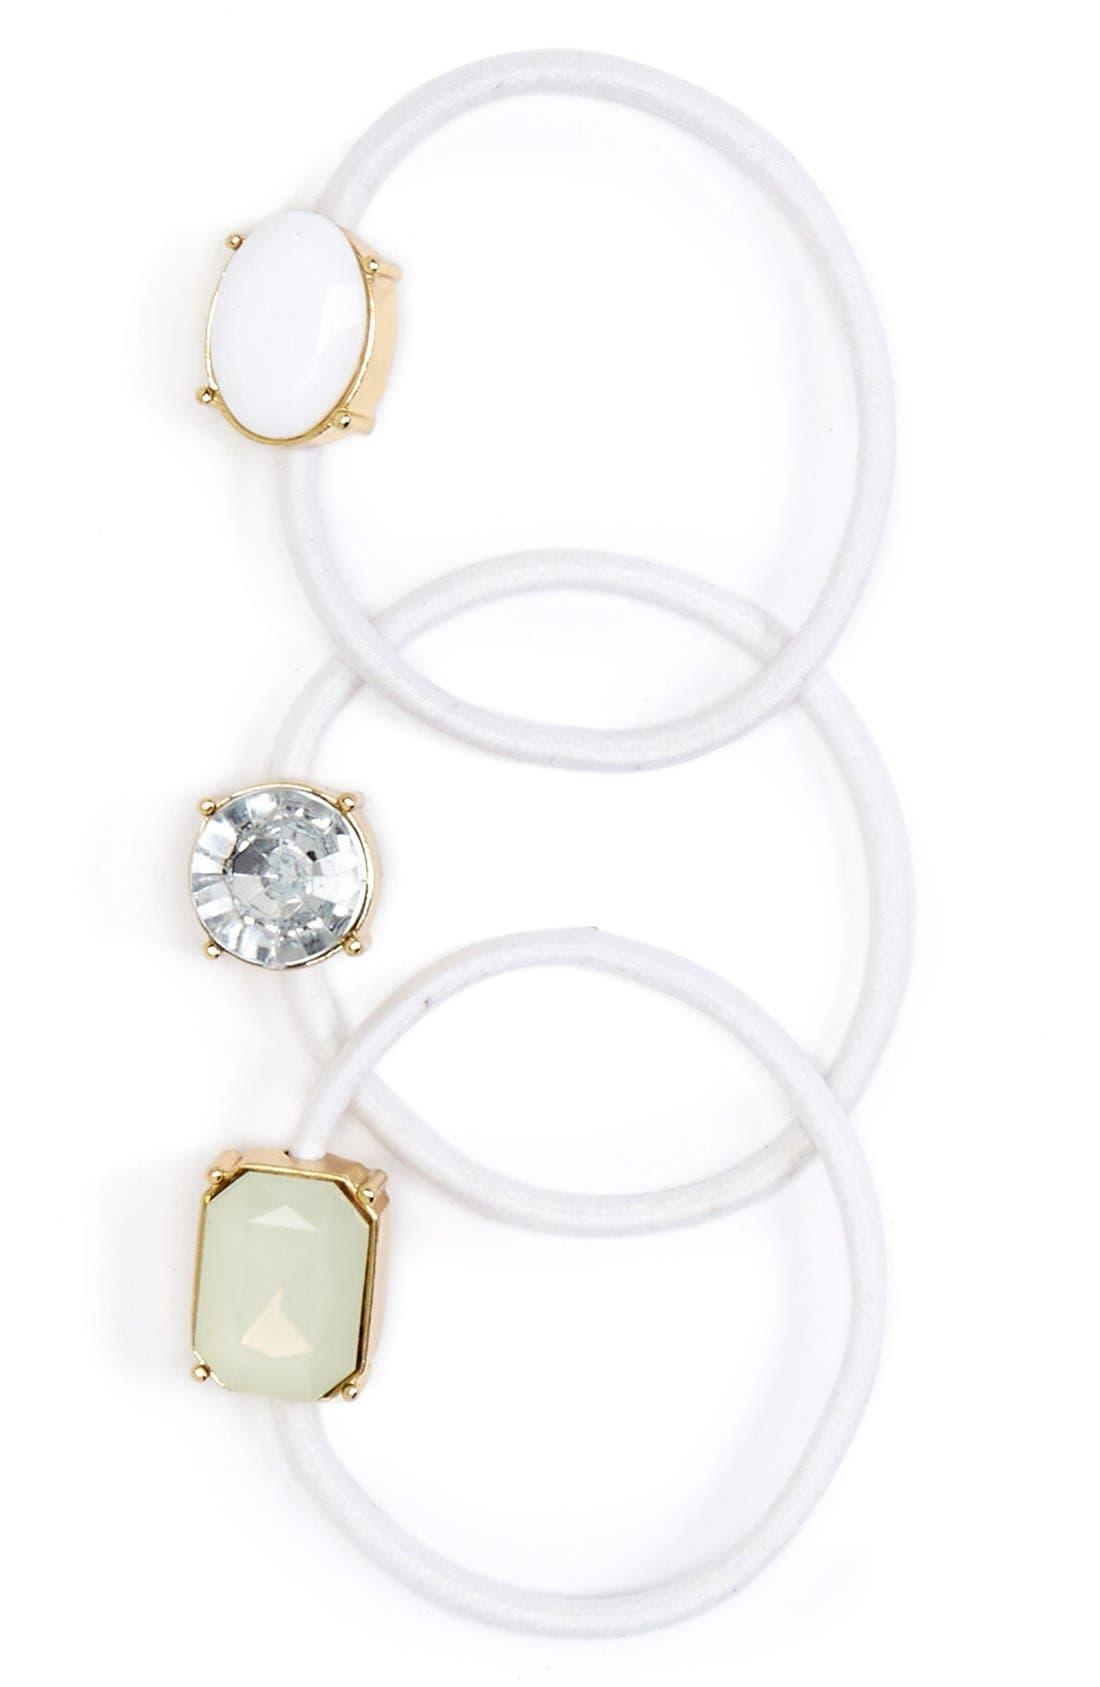 Main Image - Cara 'Bejeweled' Ponytail Holders (Set of 3)